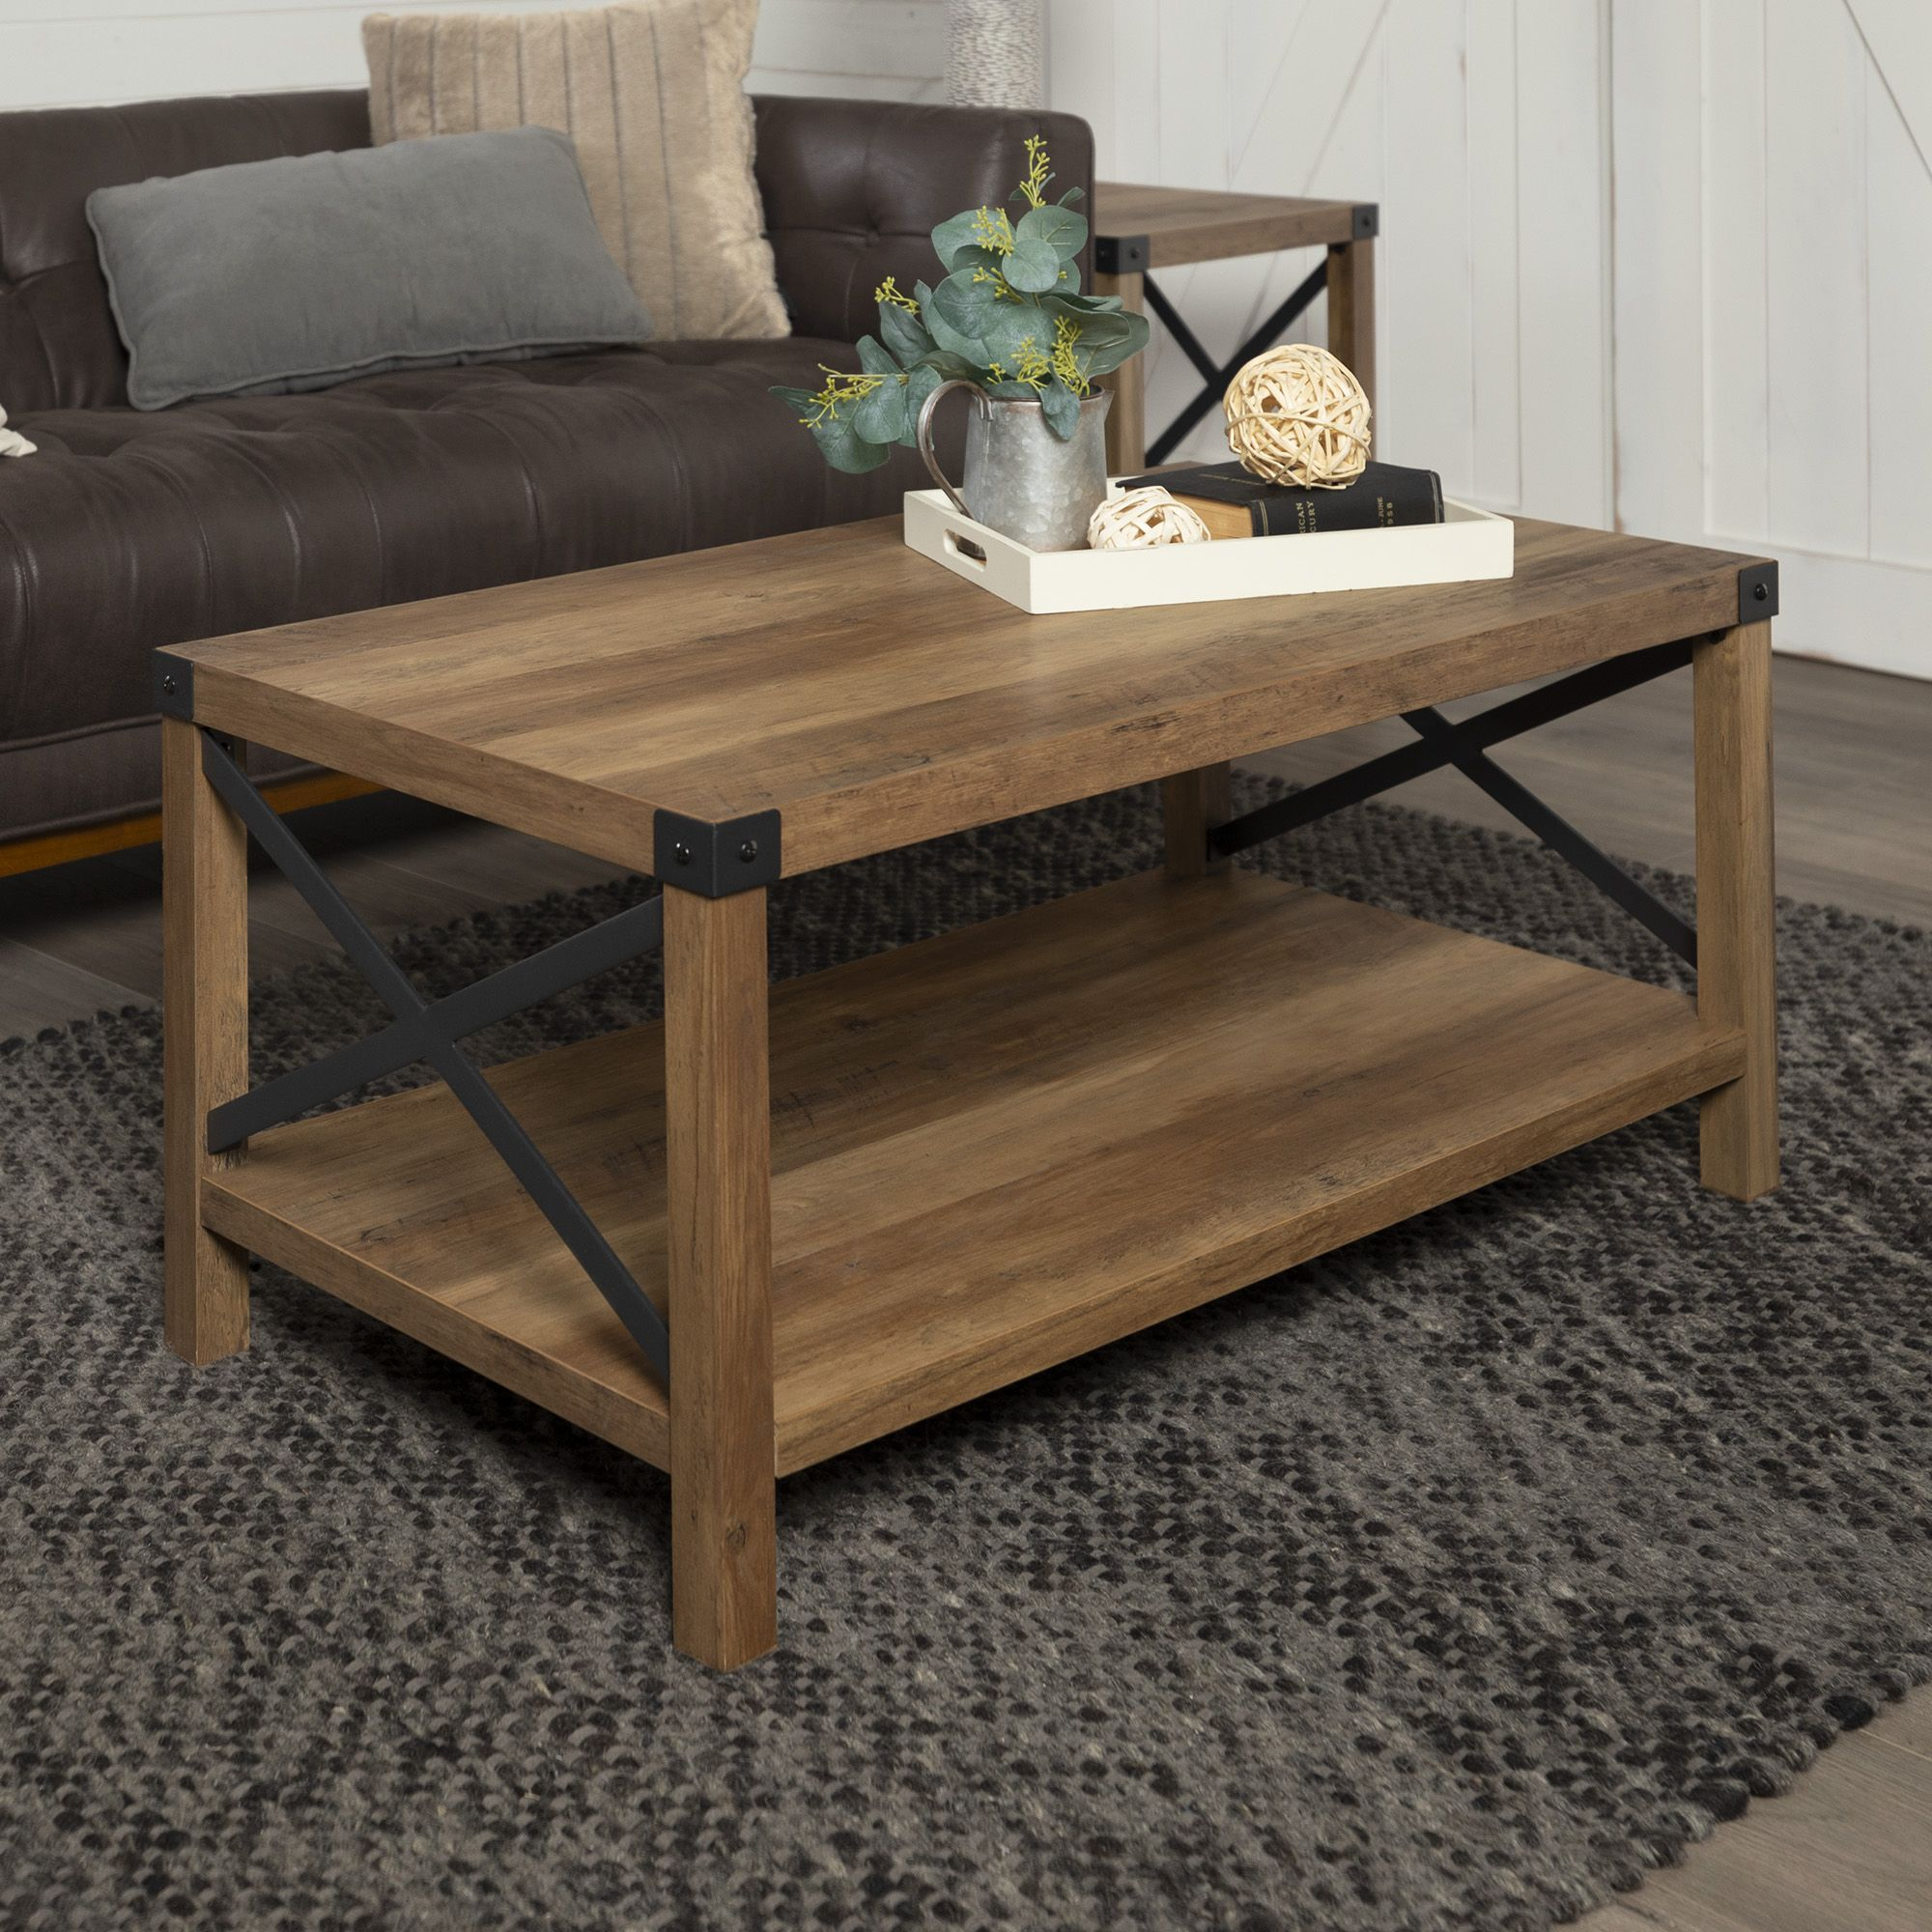 Magnolia Metal X Frame Reclaimed Barnwood Coffee Table By Desert Fields Walmart Com Wood Coffee Table Rustic Barnwood Coffee Table Coffee Table